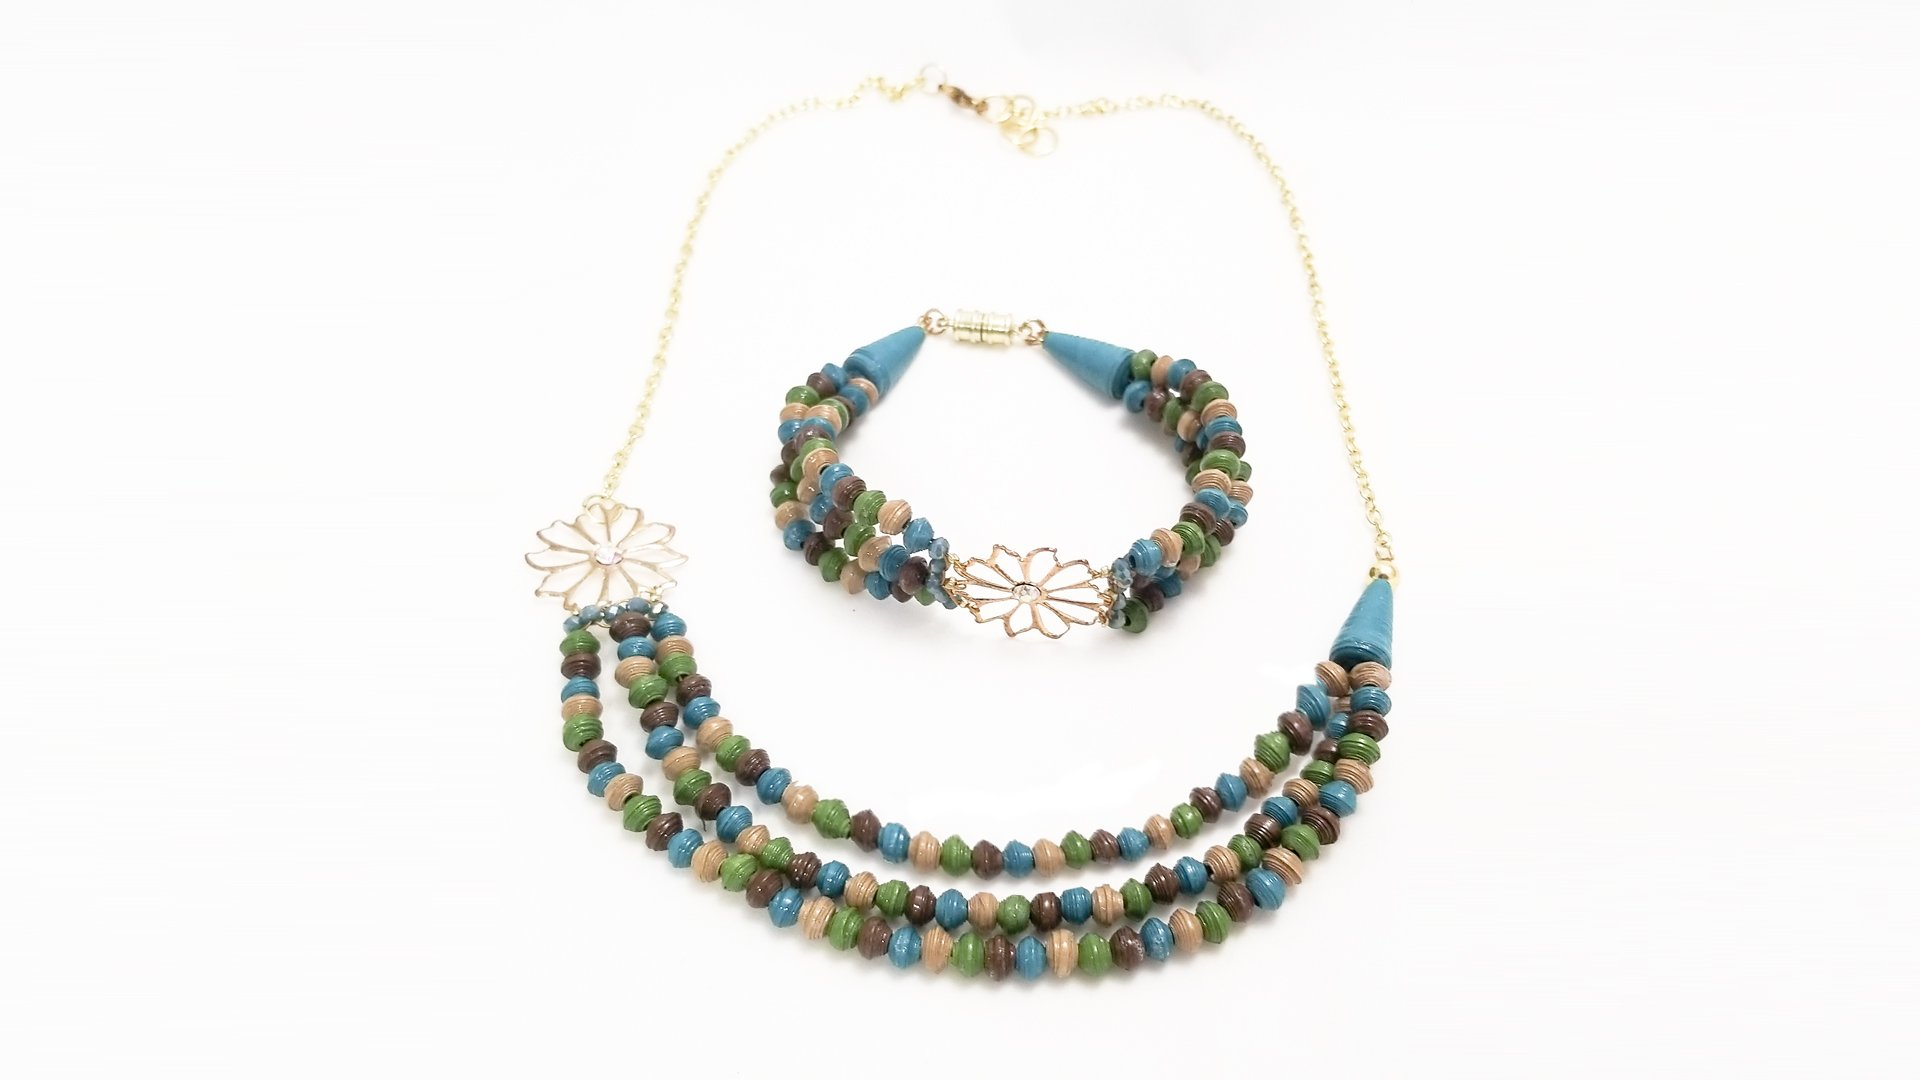 Multi-Strand Paper Bead Bracelet Necklace